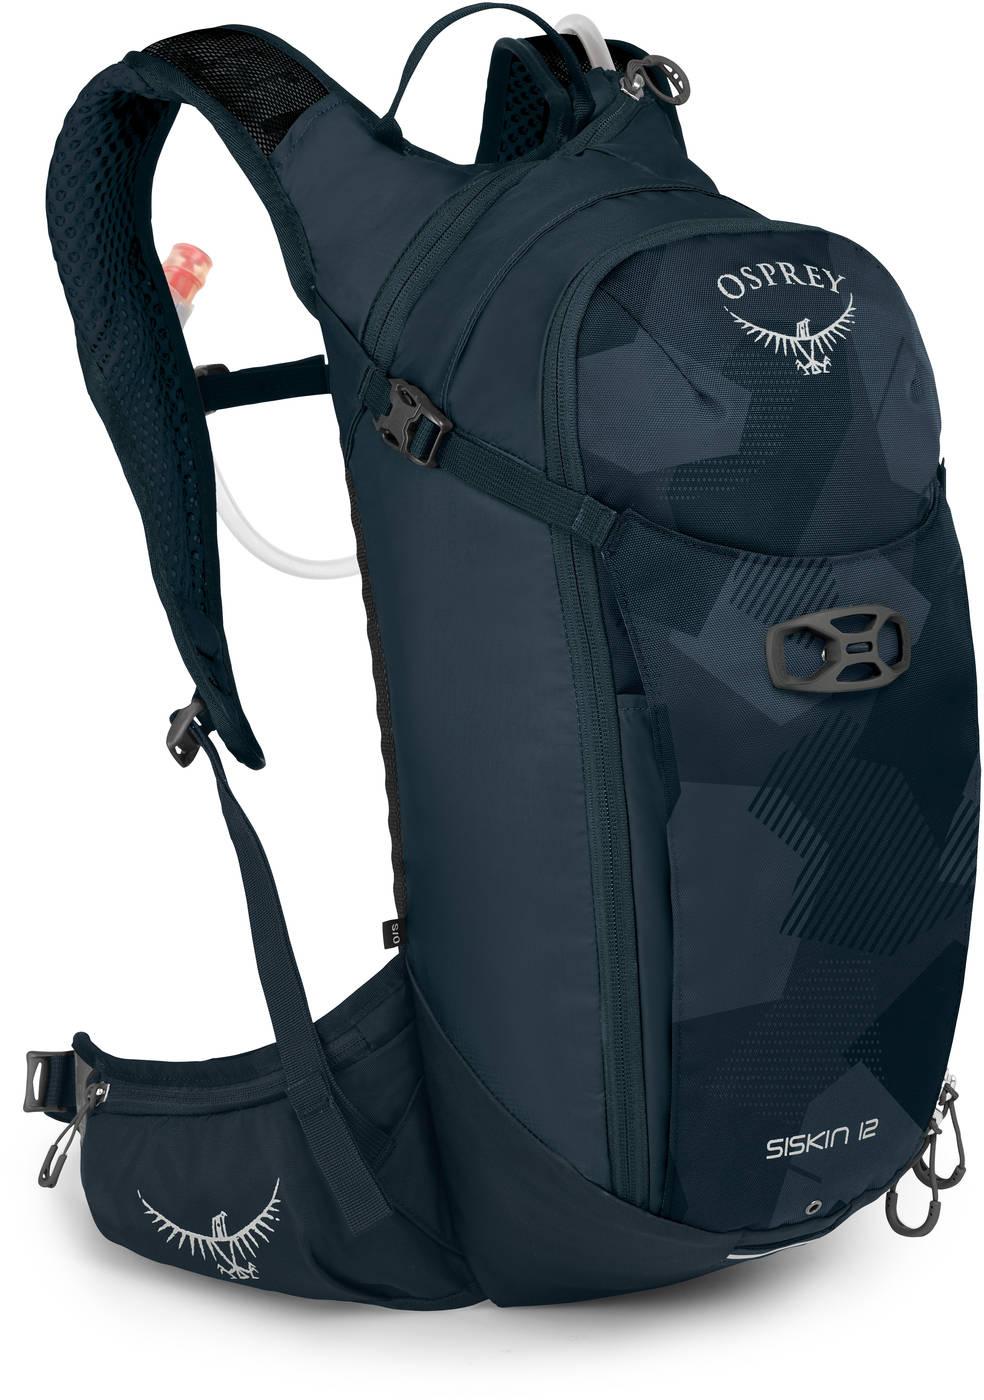 Велорюкзаки Рюкзак велосипедый Osprey Siskin 12 Slate Blue Siskin_12_S19_Side_Slate_Blue_web.jpg